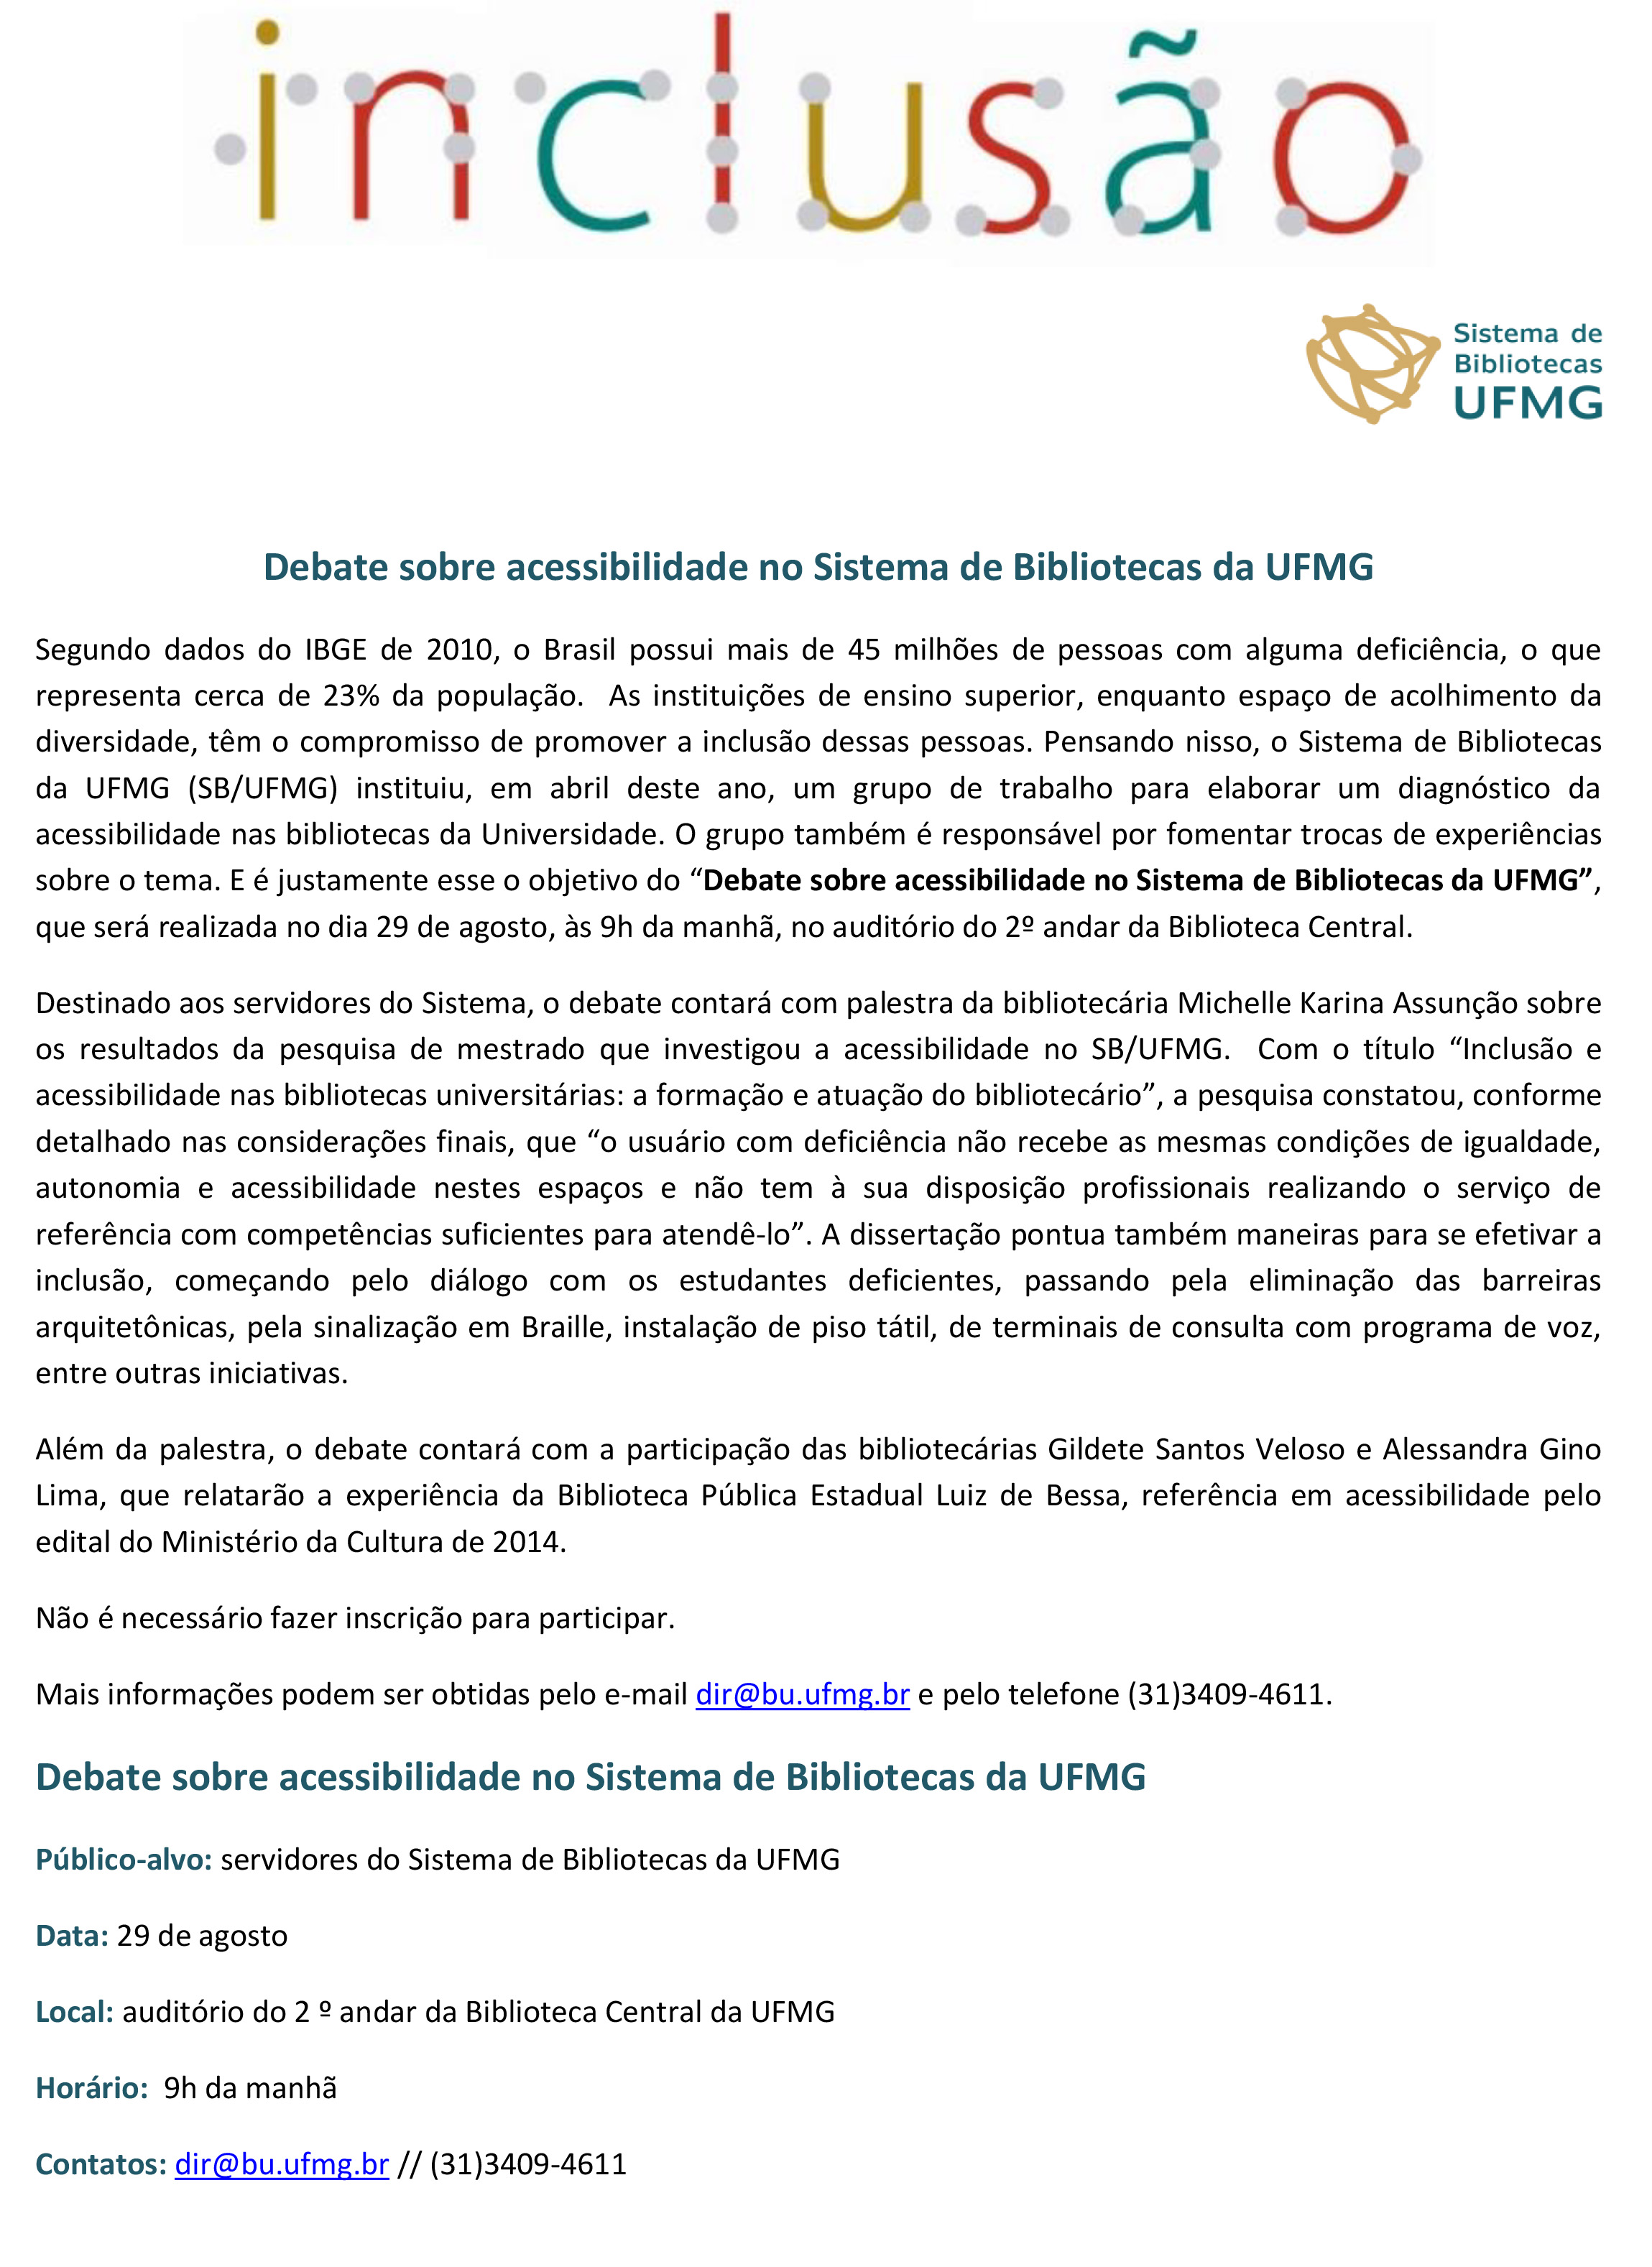 Debate sobre acessibilidade UFMG